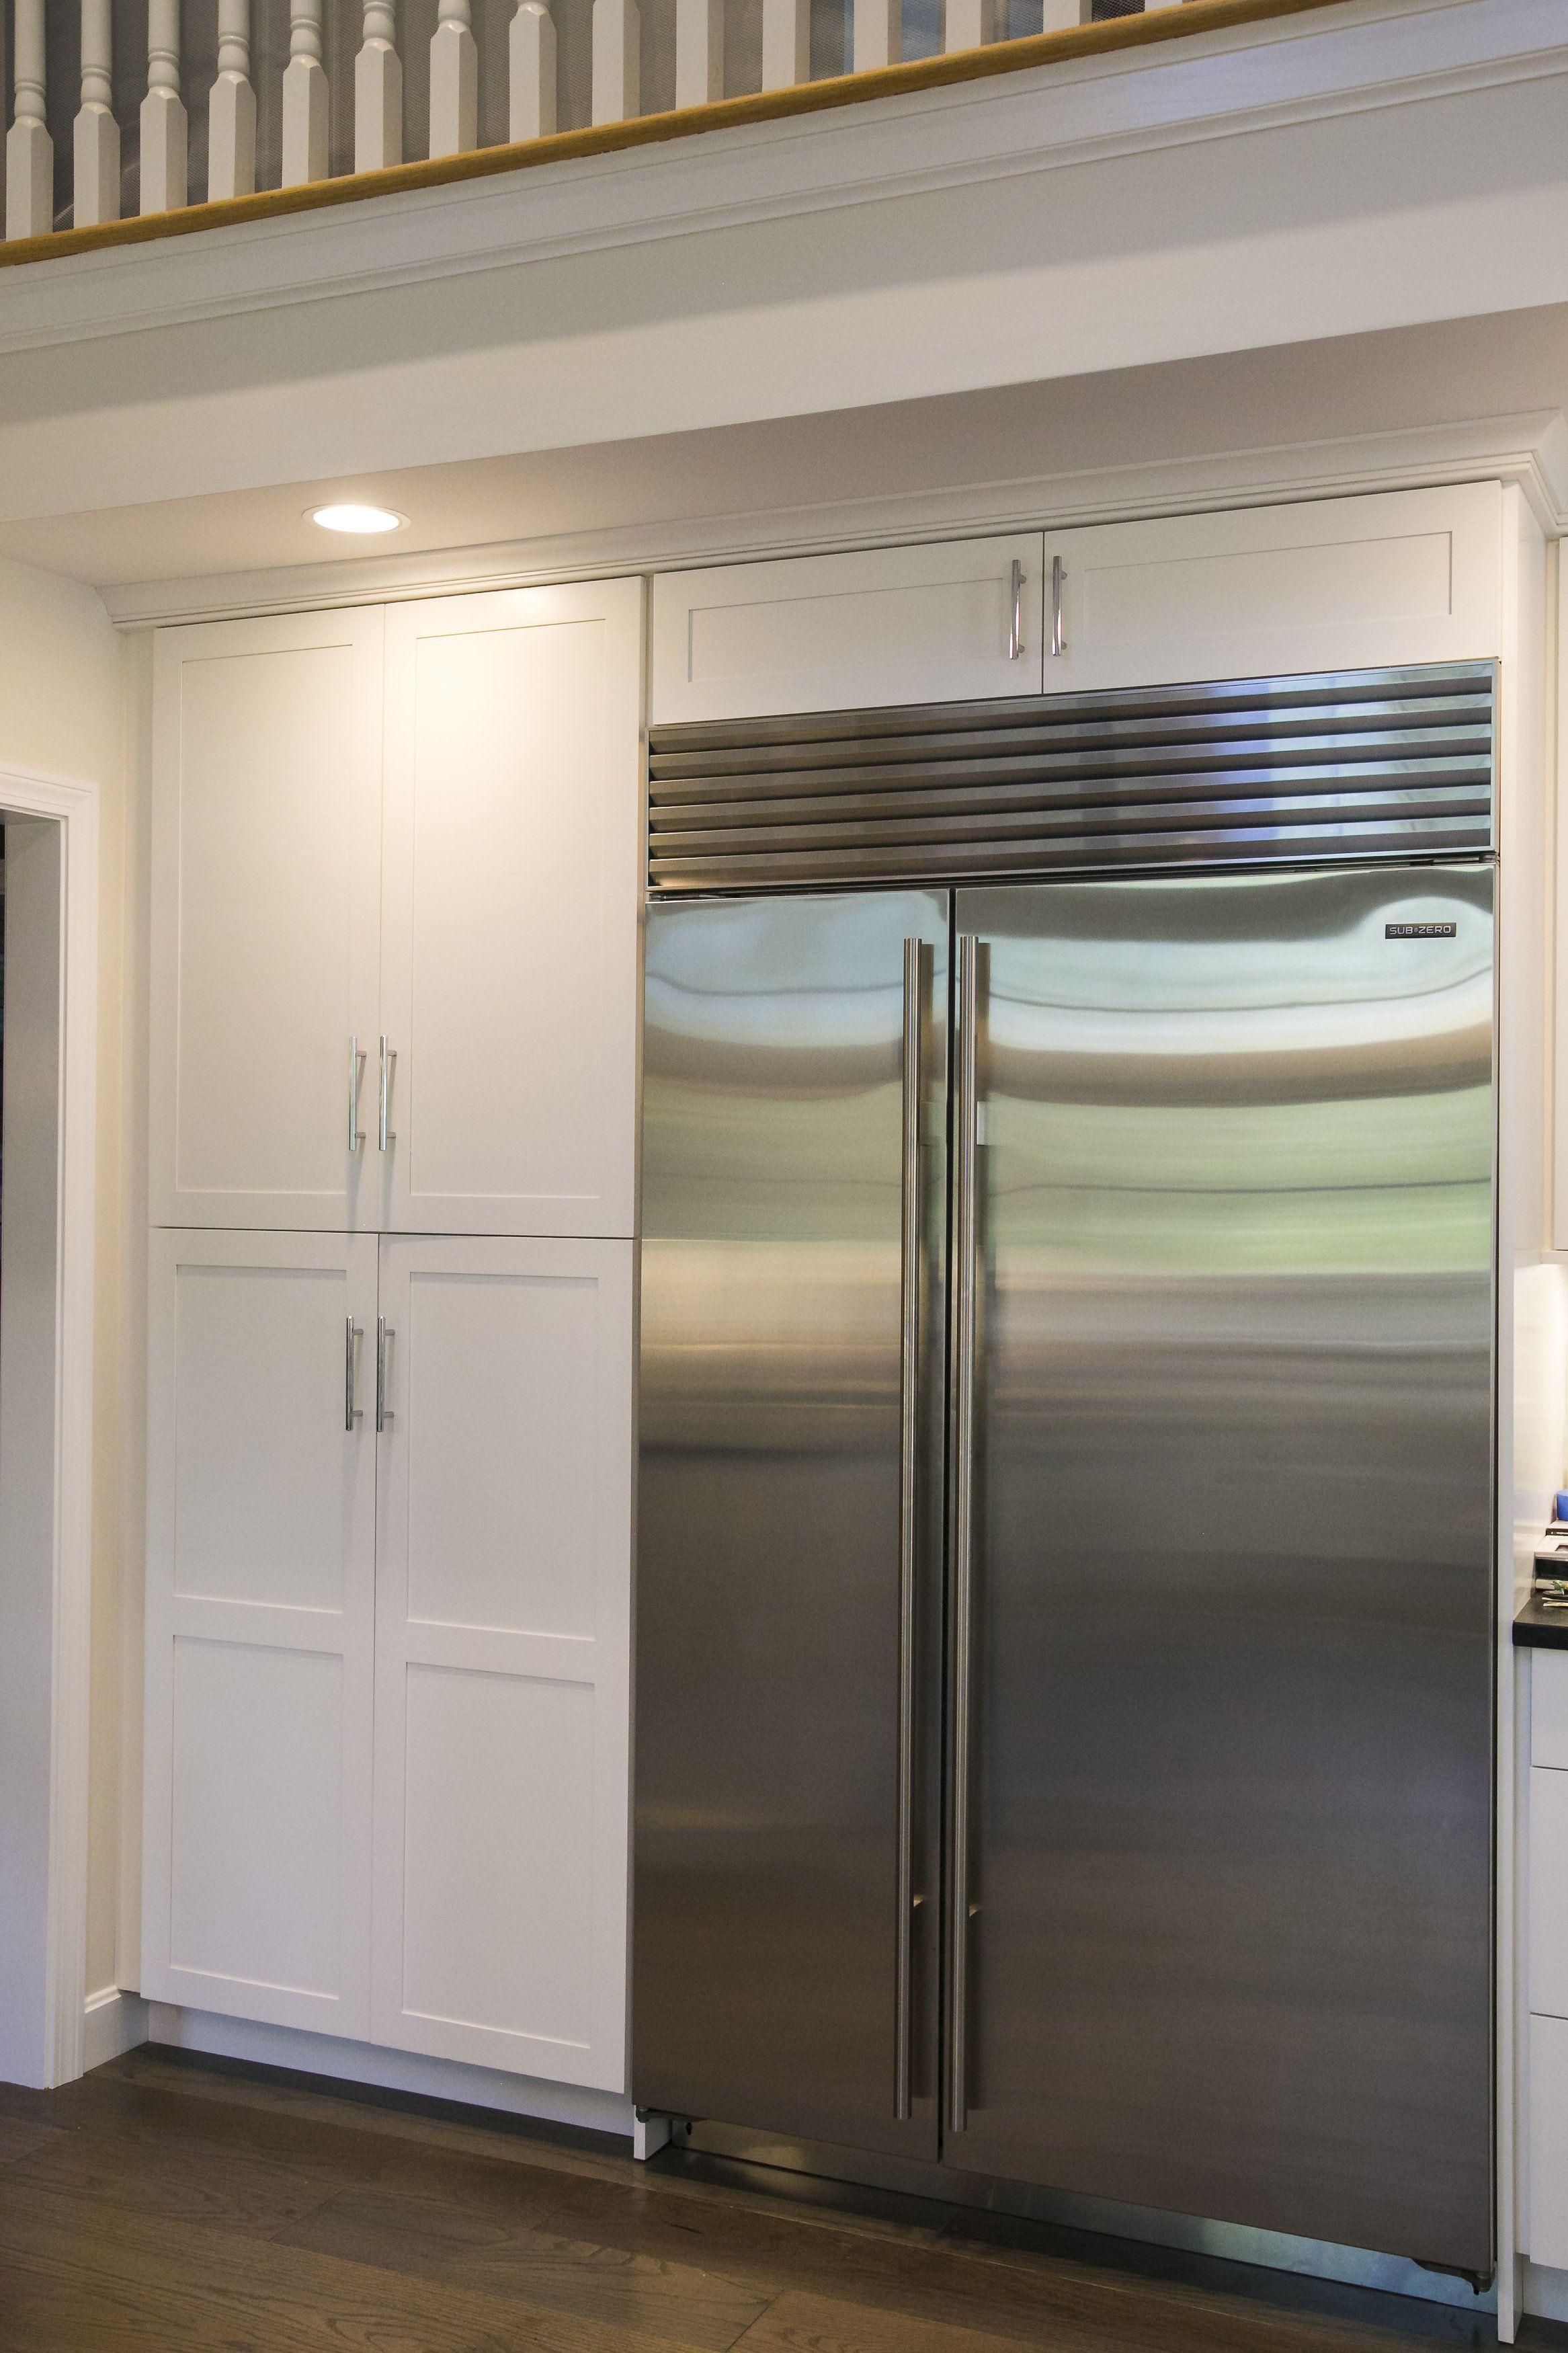 White Shaker Cabinets With Modern Brushed Nickel Finishes Custom Built Around Subzero Refrigerator White Shaker Cabinets Kitchen Cabinets Trim Shaker Cabinets